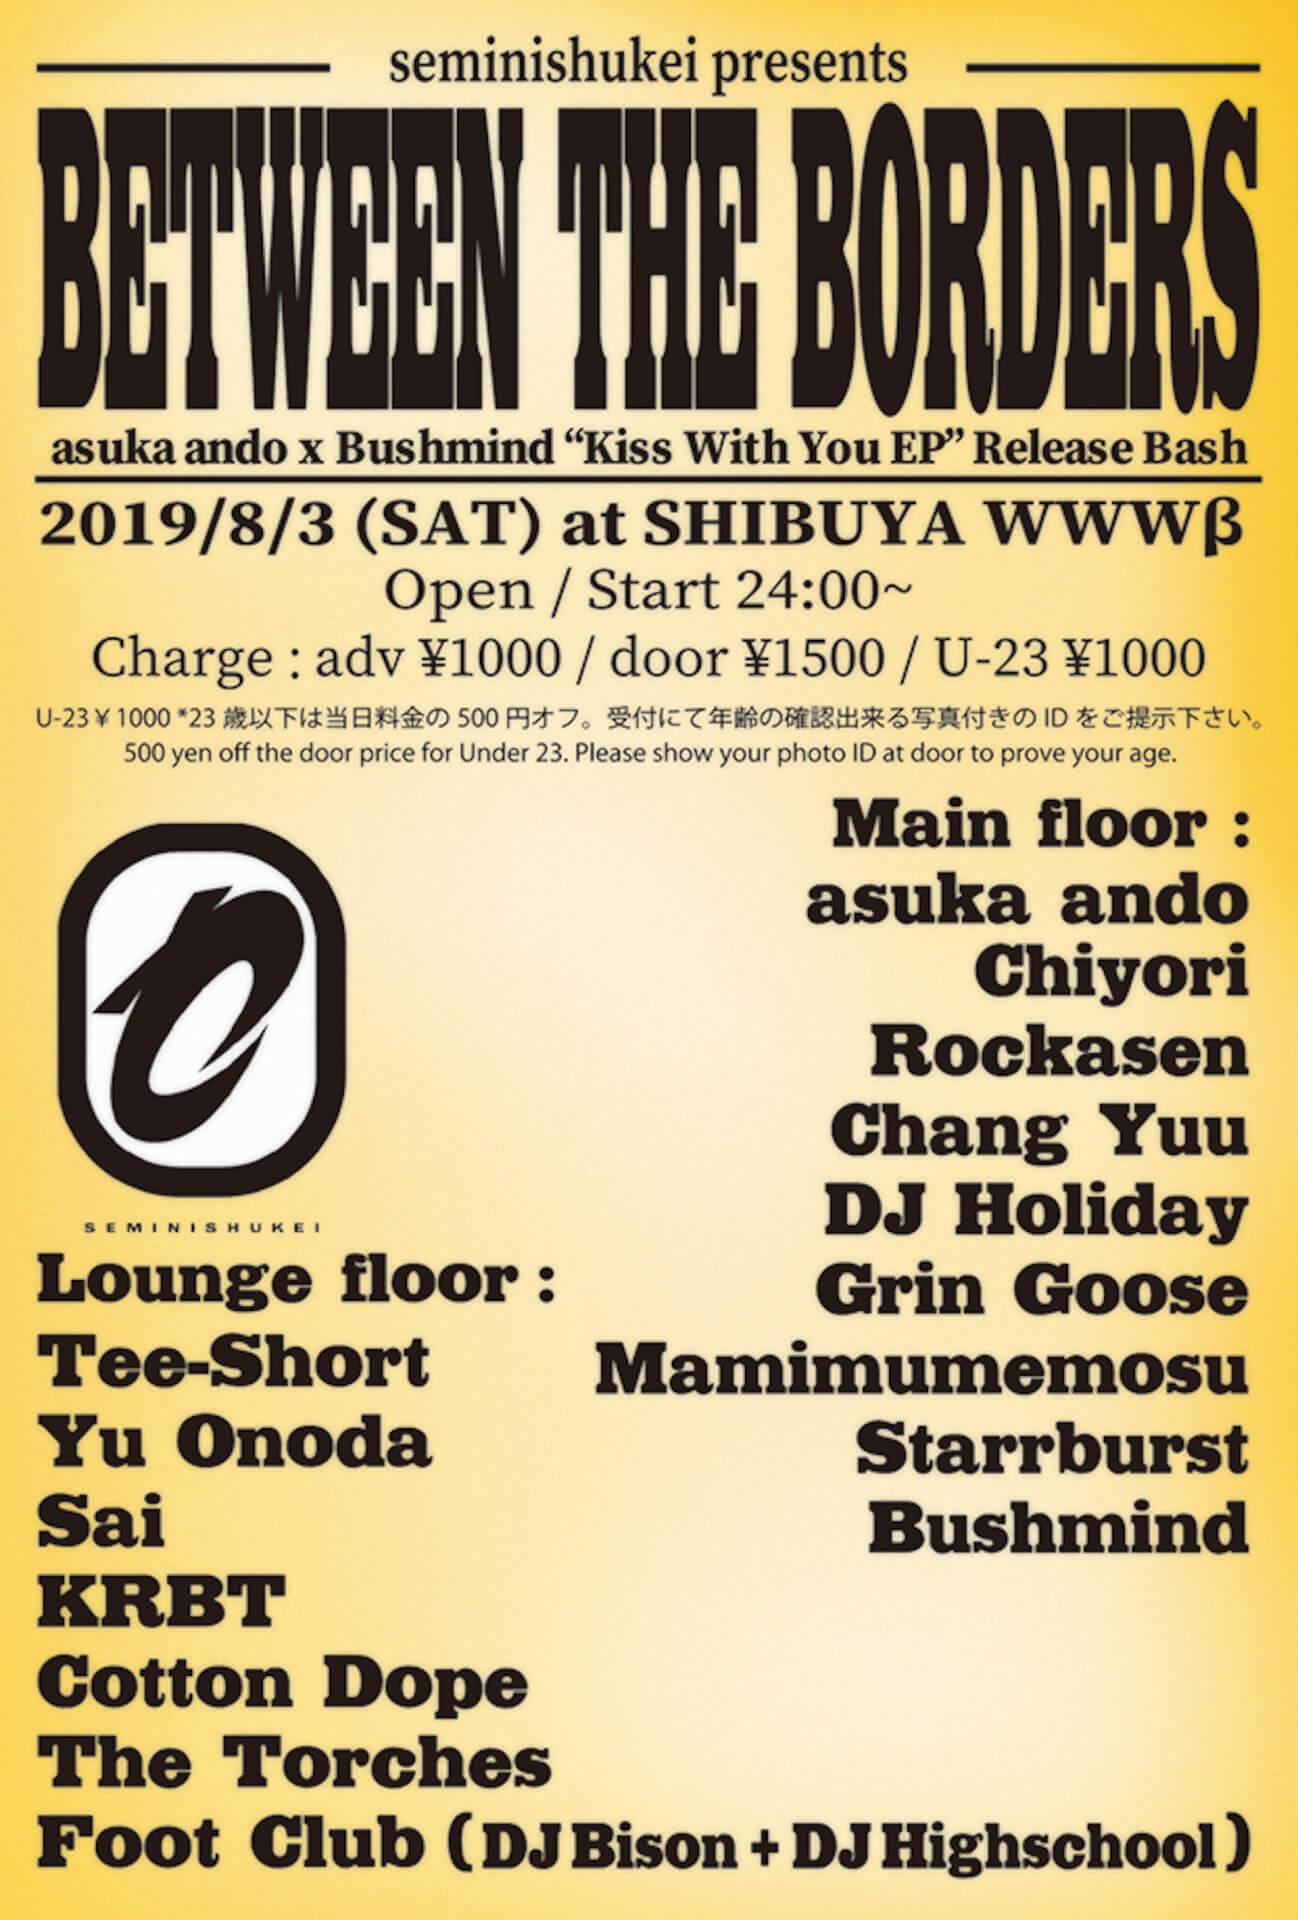 Seminishukeiによる<Between The Boarders>の第2回がWWWβにて開催|Bushmind x asuka andoのリリースバッシュに music190717-between-the-boarders-2